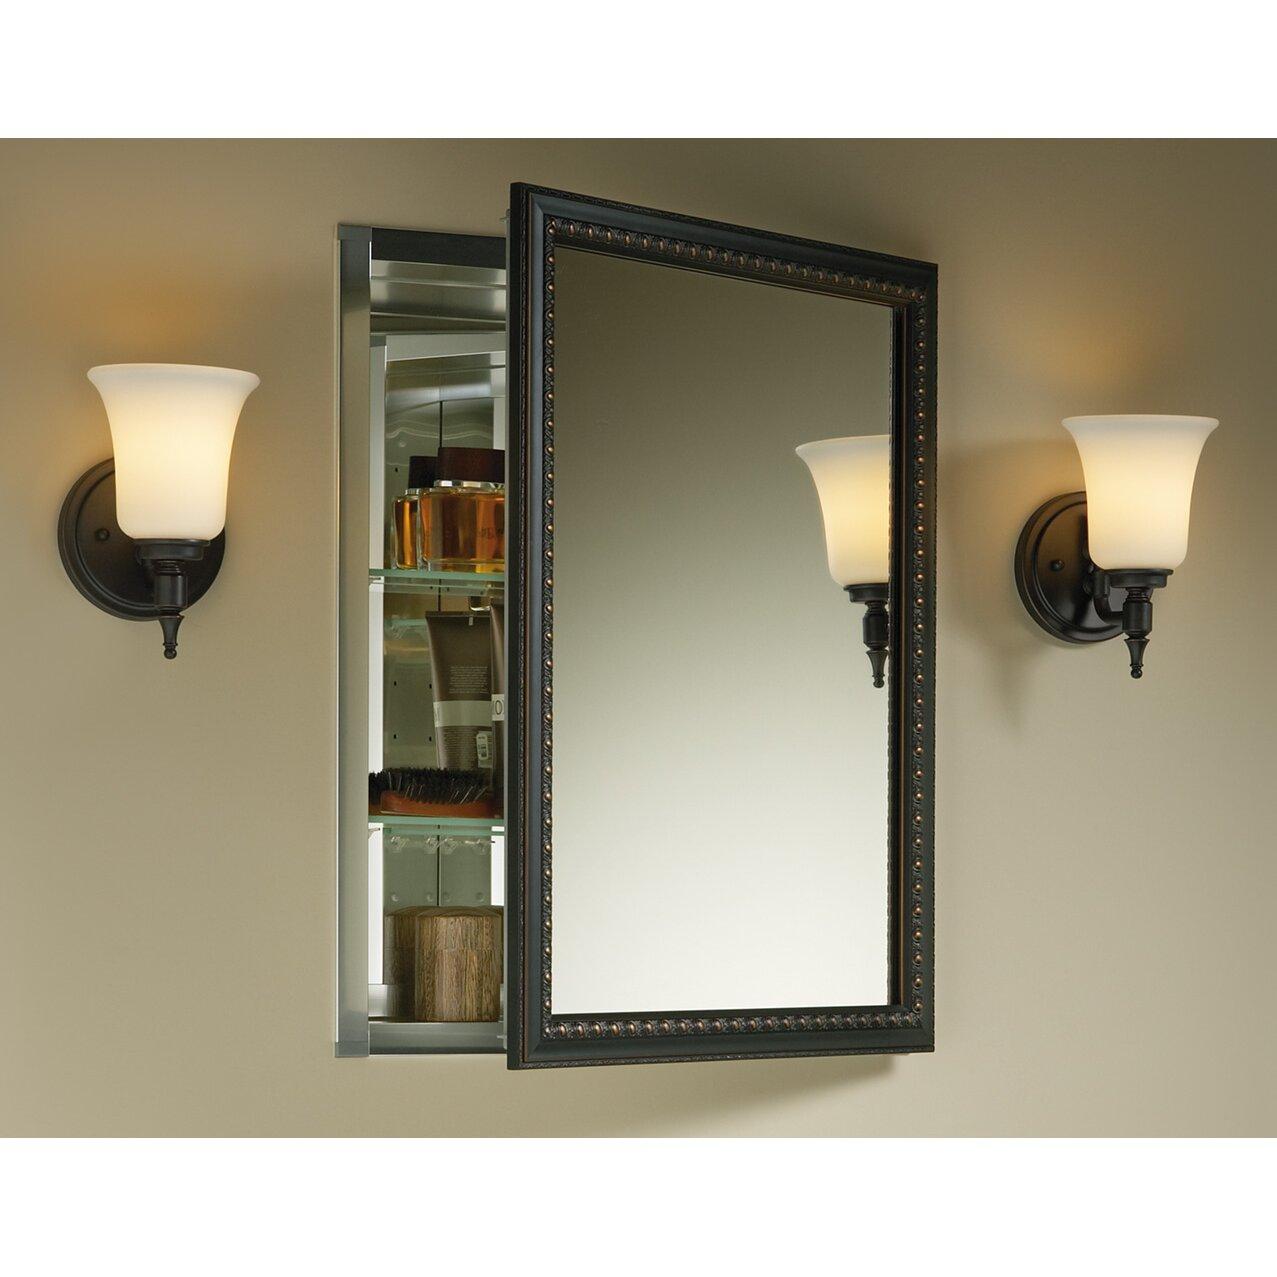 Kohler 20 X 26 Wall Mount Mirrored Medicine Cabinet .